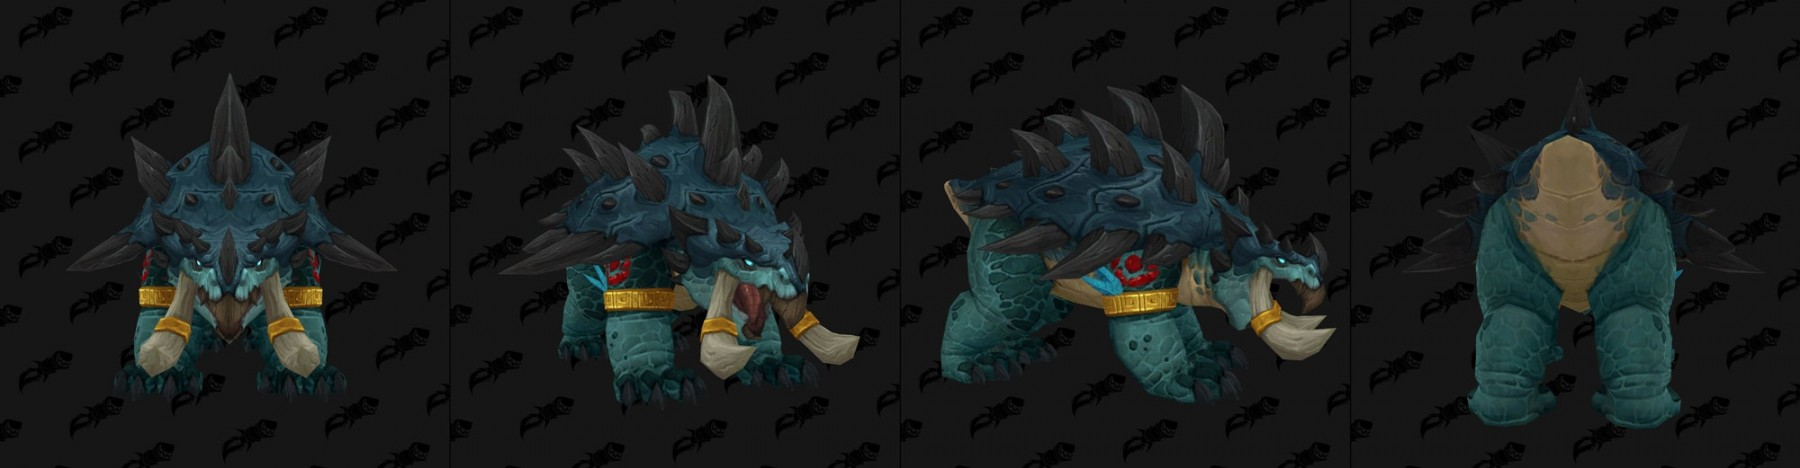 Forme d'ours - Troll zandalari